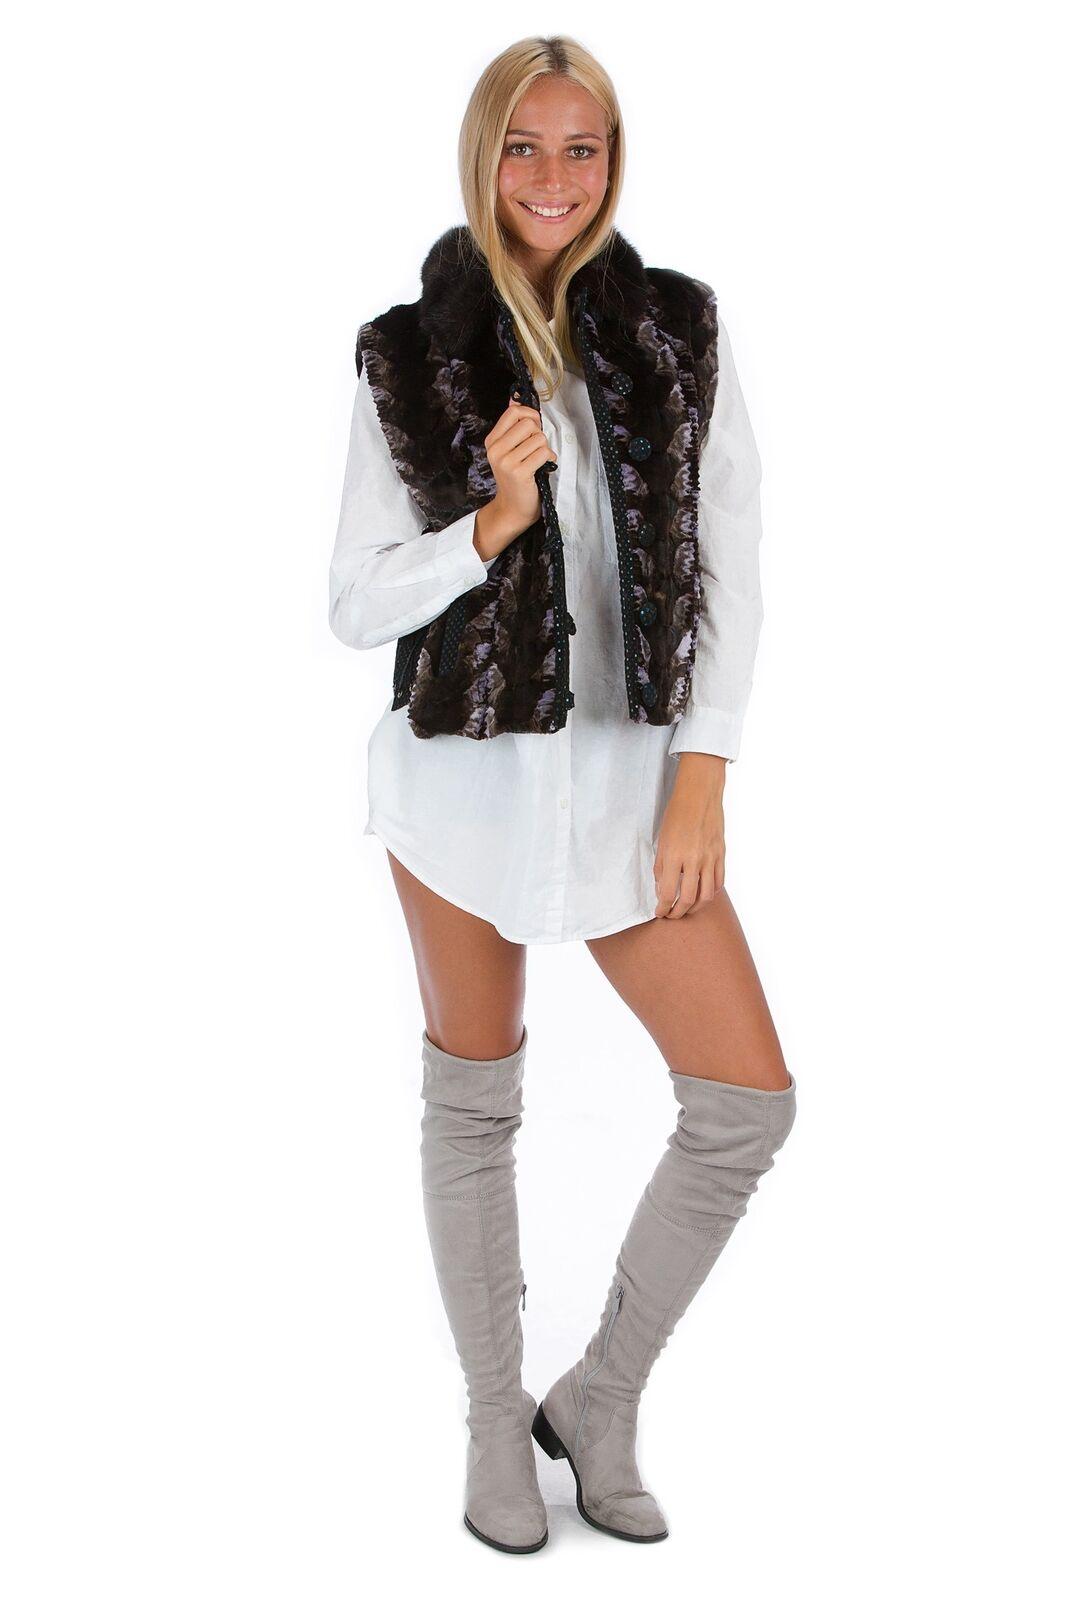 Nerz Fellweste lila braun Luxus Fashion Pelz Mode Mink Style 38 - 40 fur vest ме